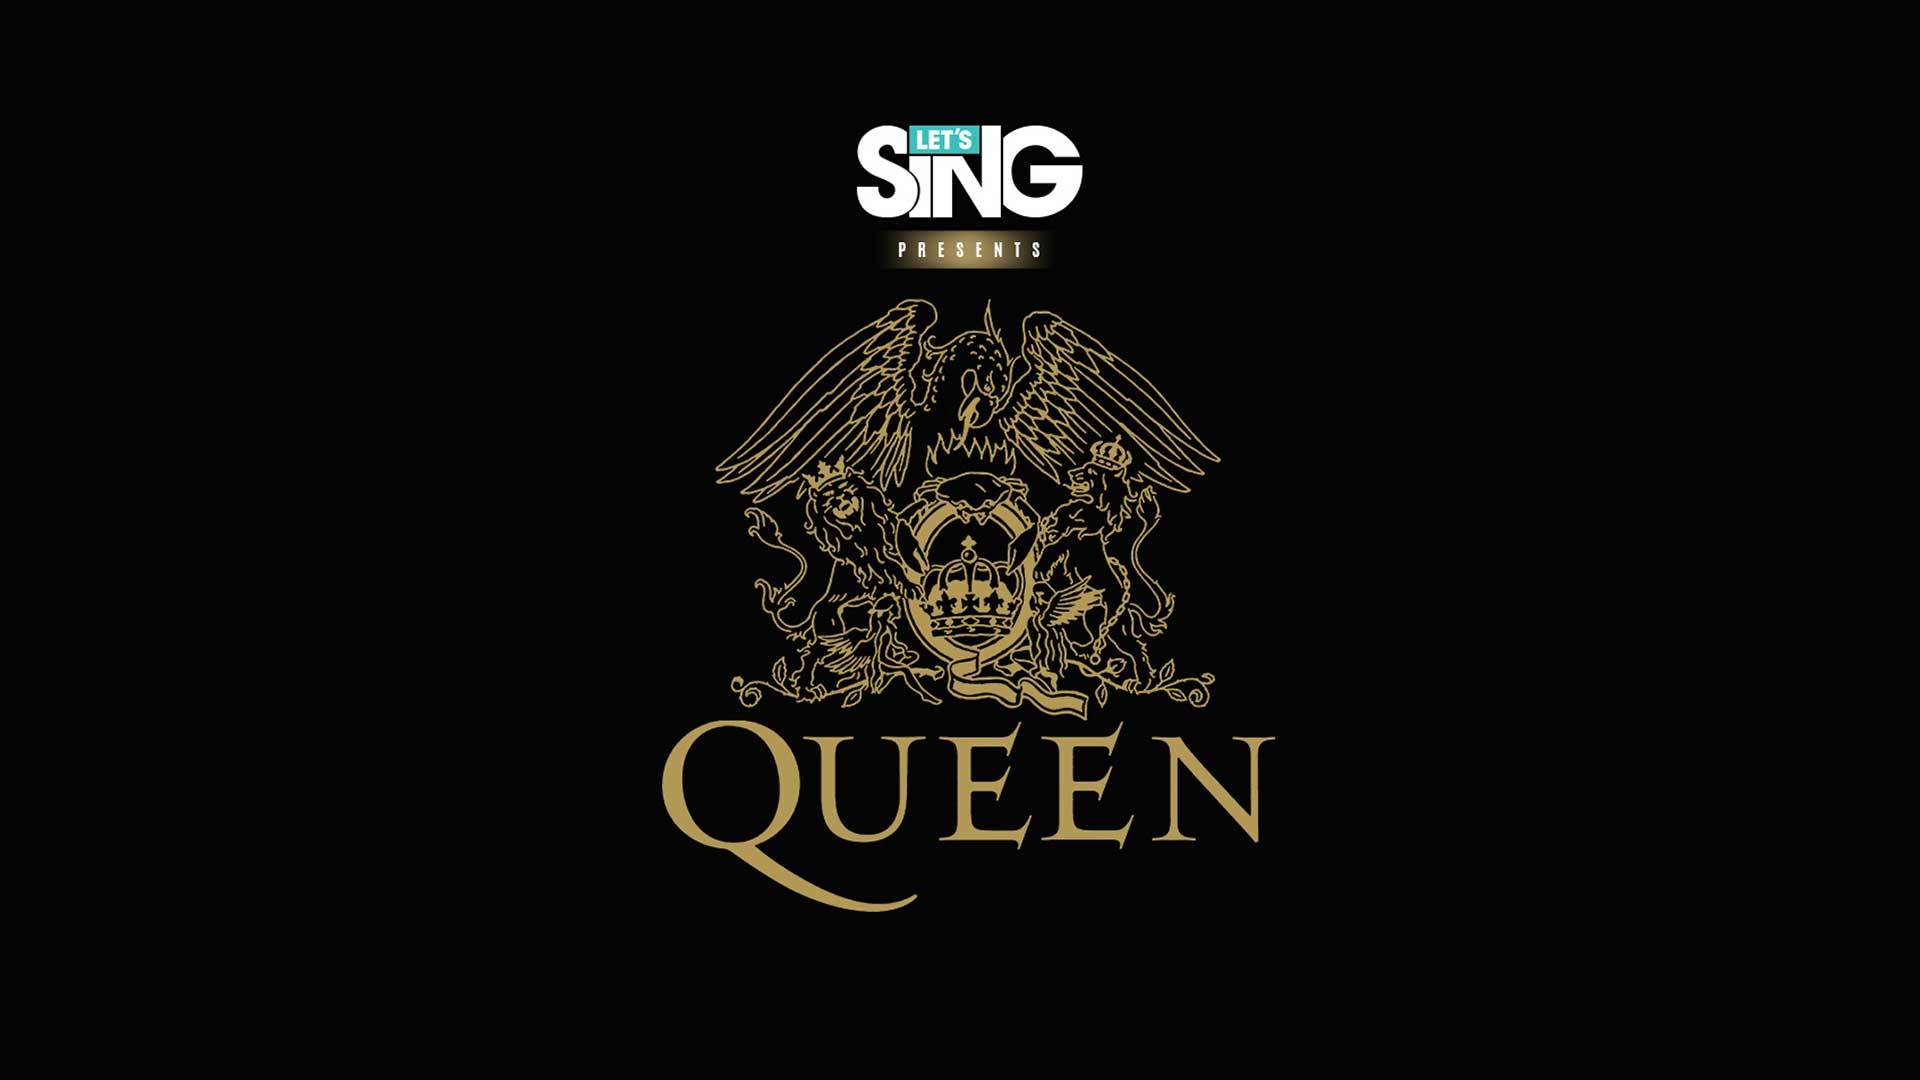 lets sing queen edition logo black